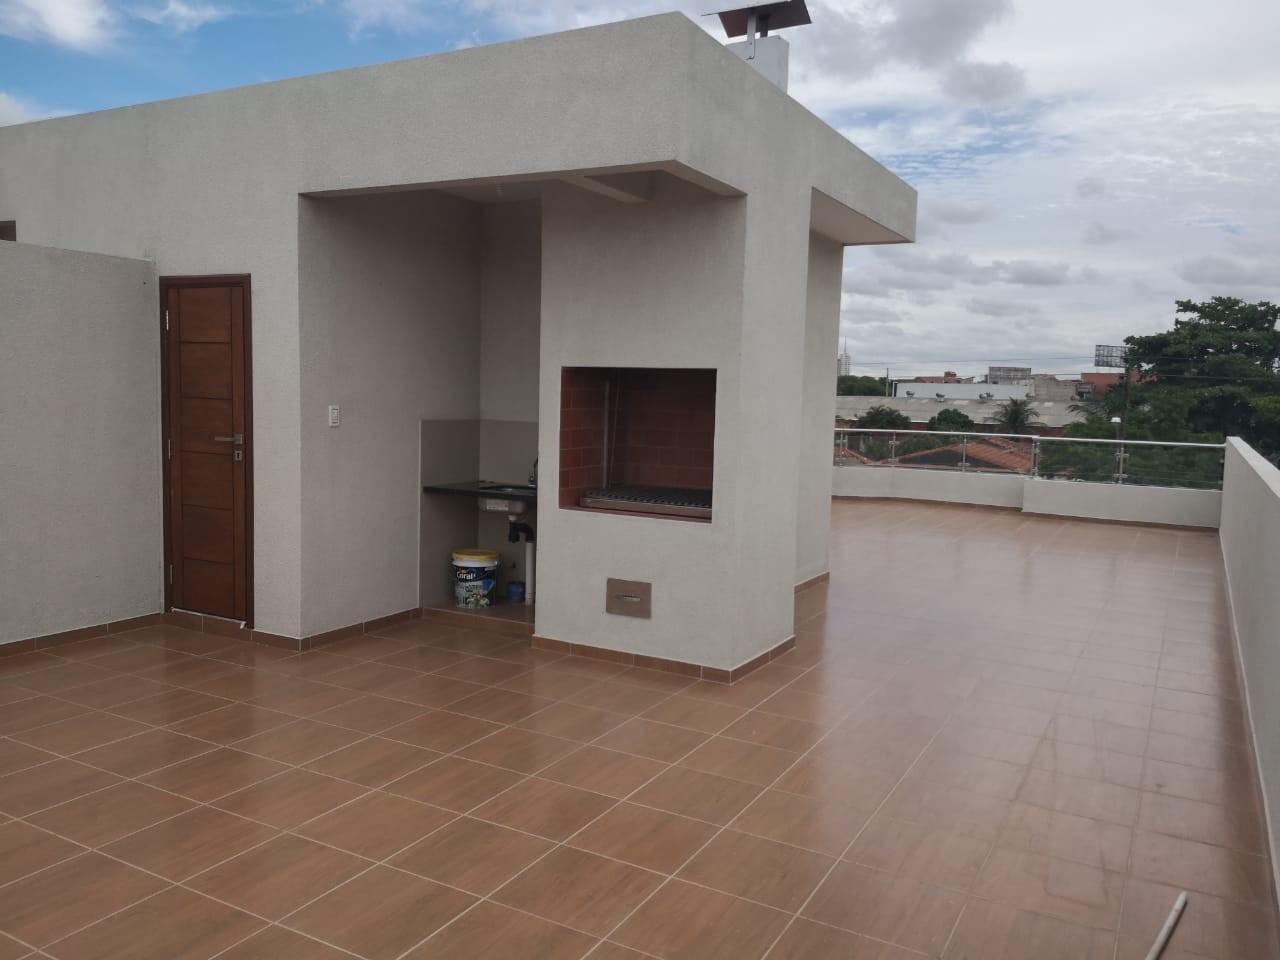 Casa en Venta AV. RADIAL 26 A DOS CUADRAS DEL 4TO ANILLO Foto 25